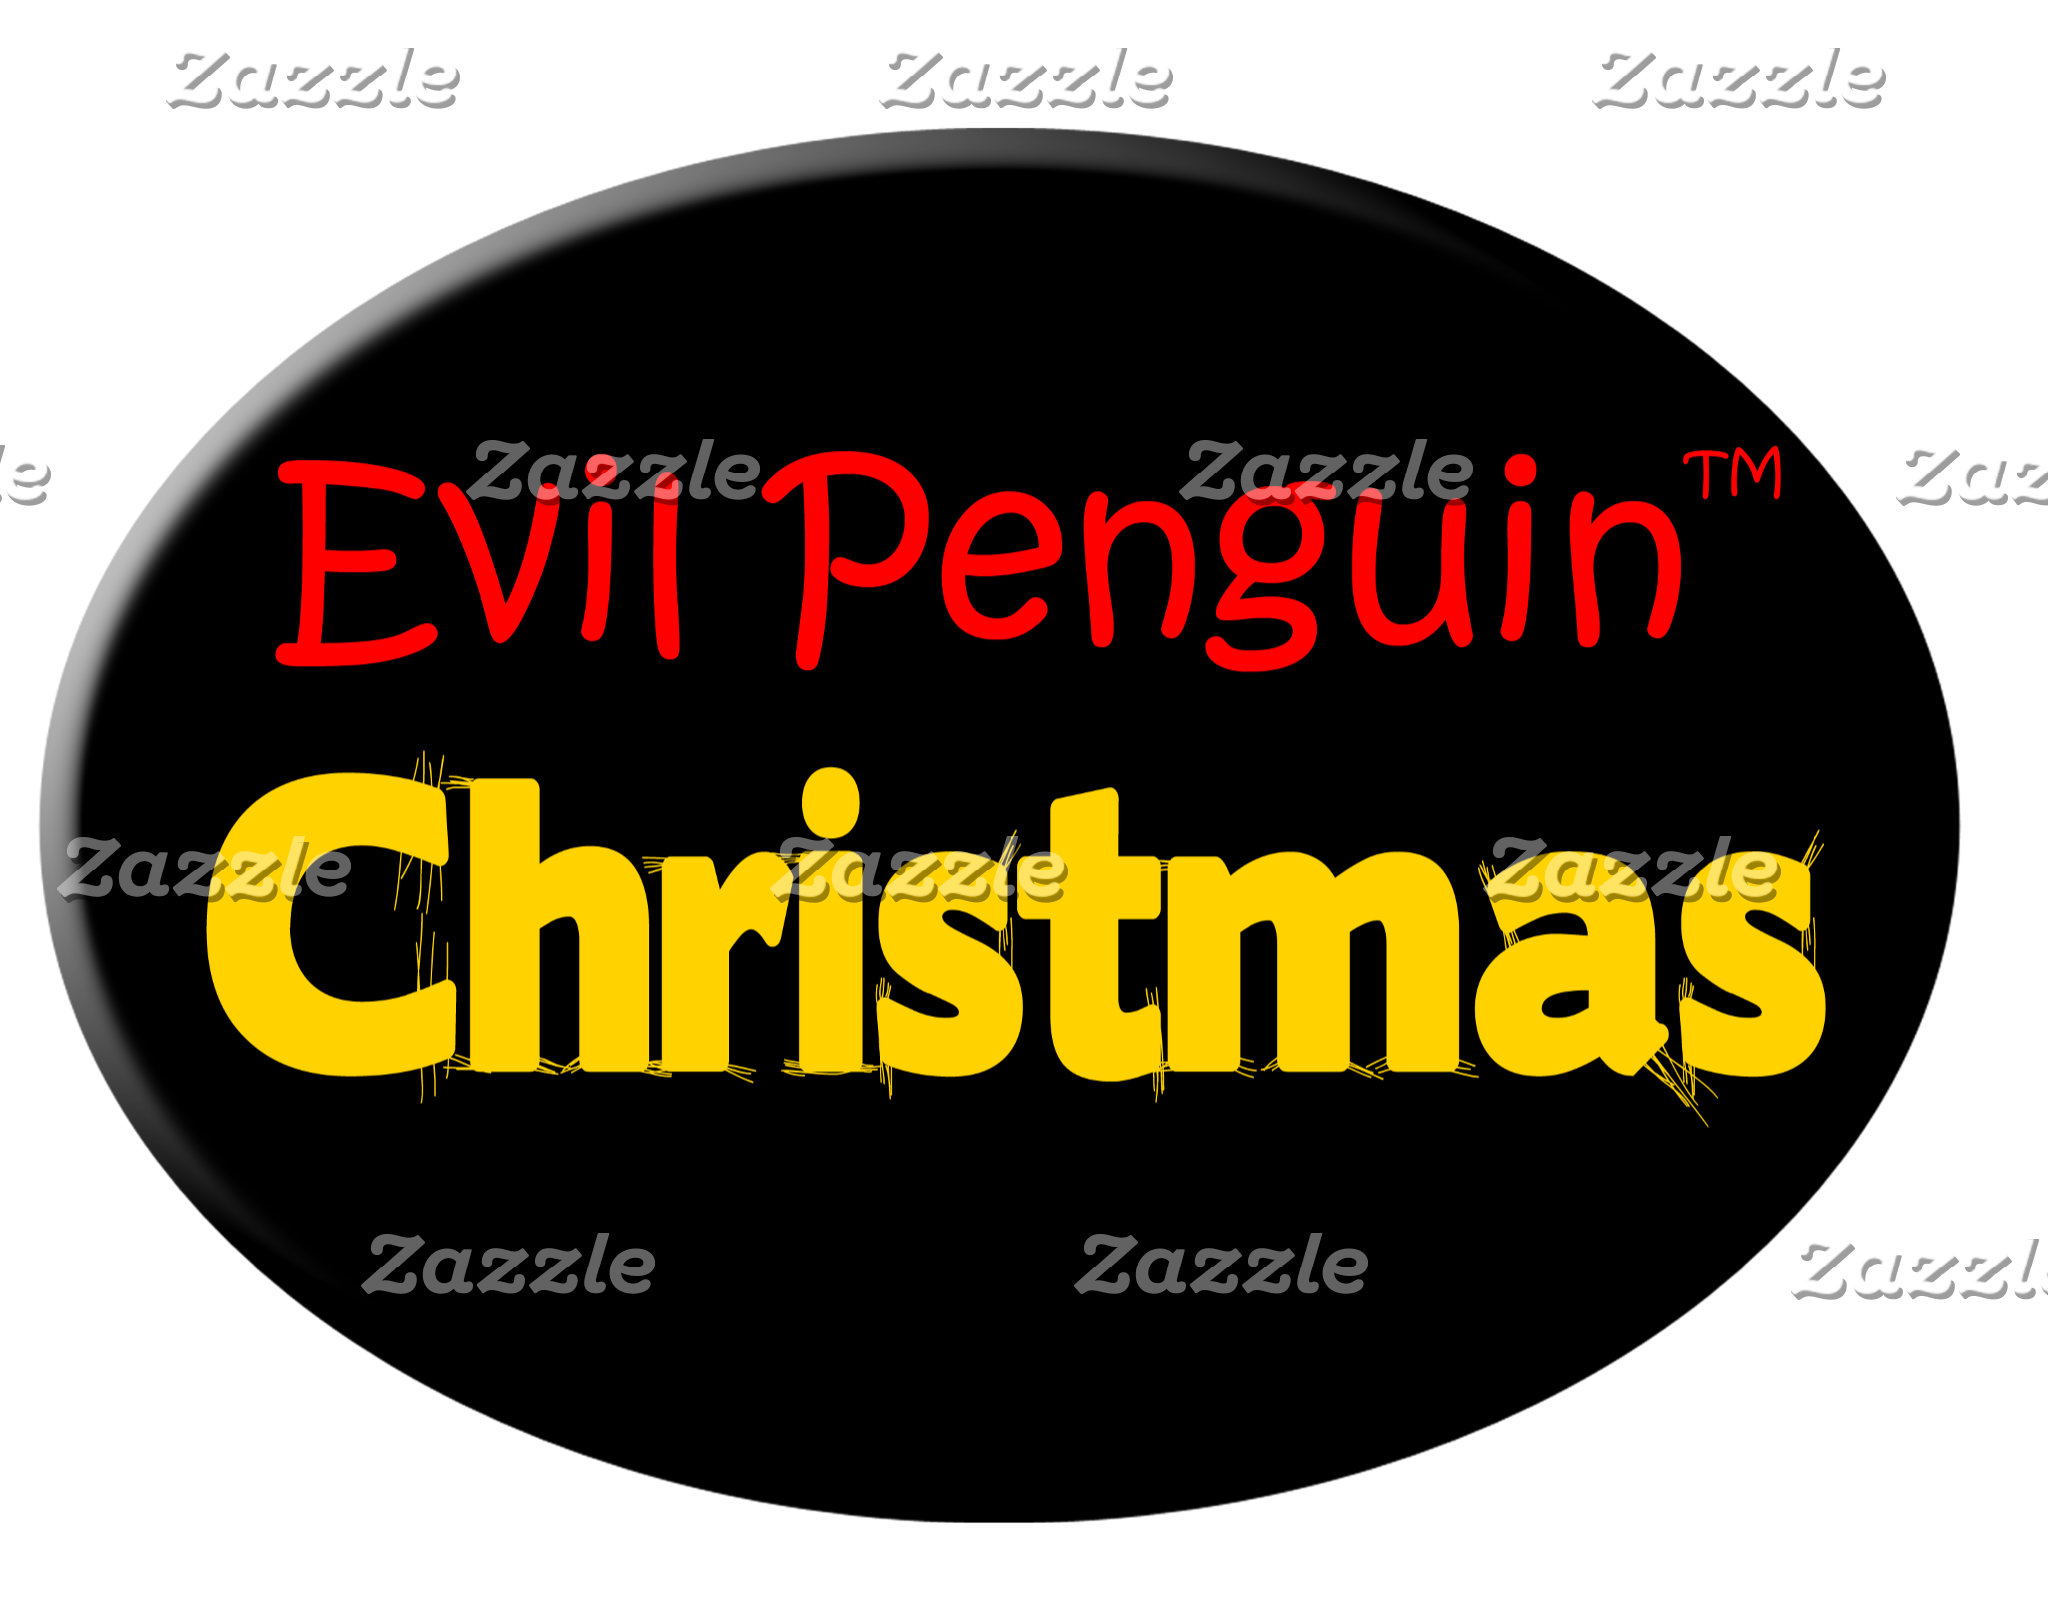 Christmas Gifts and more!